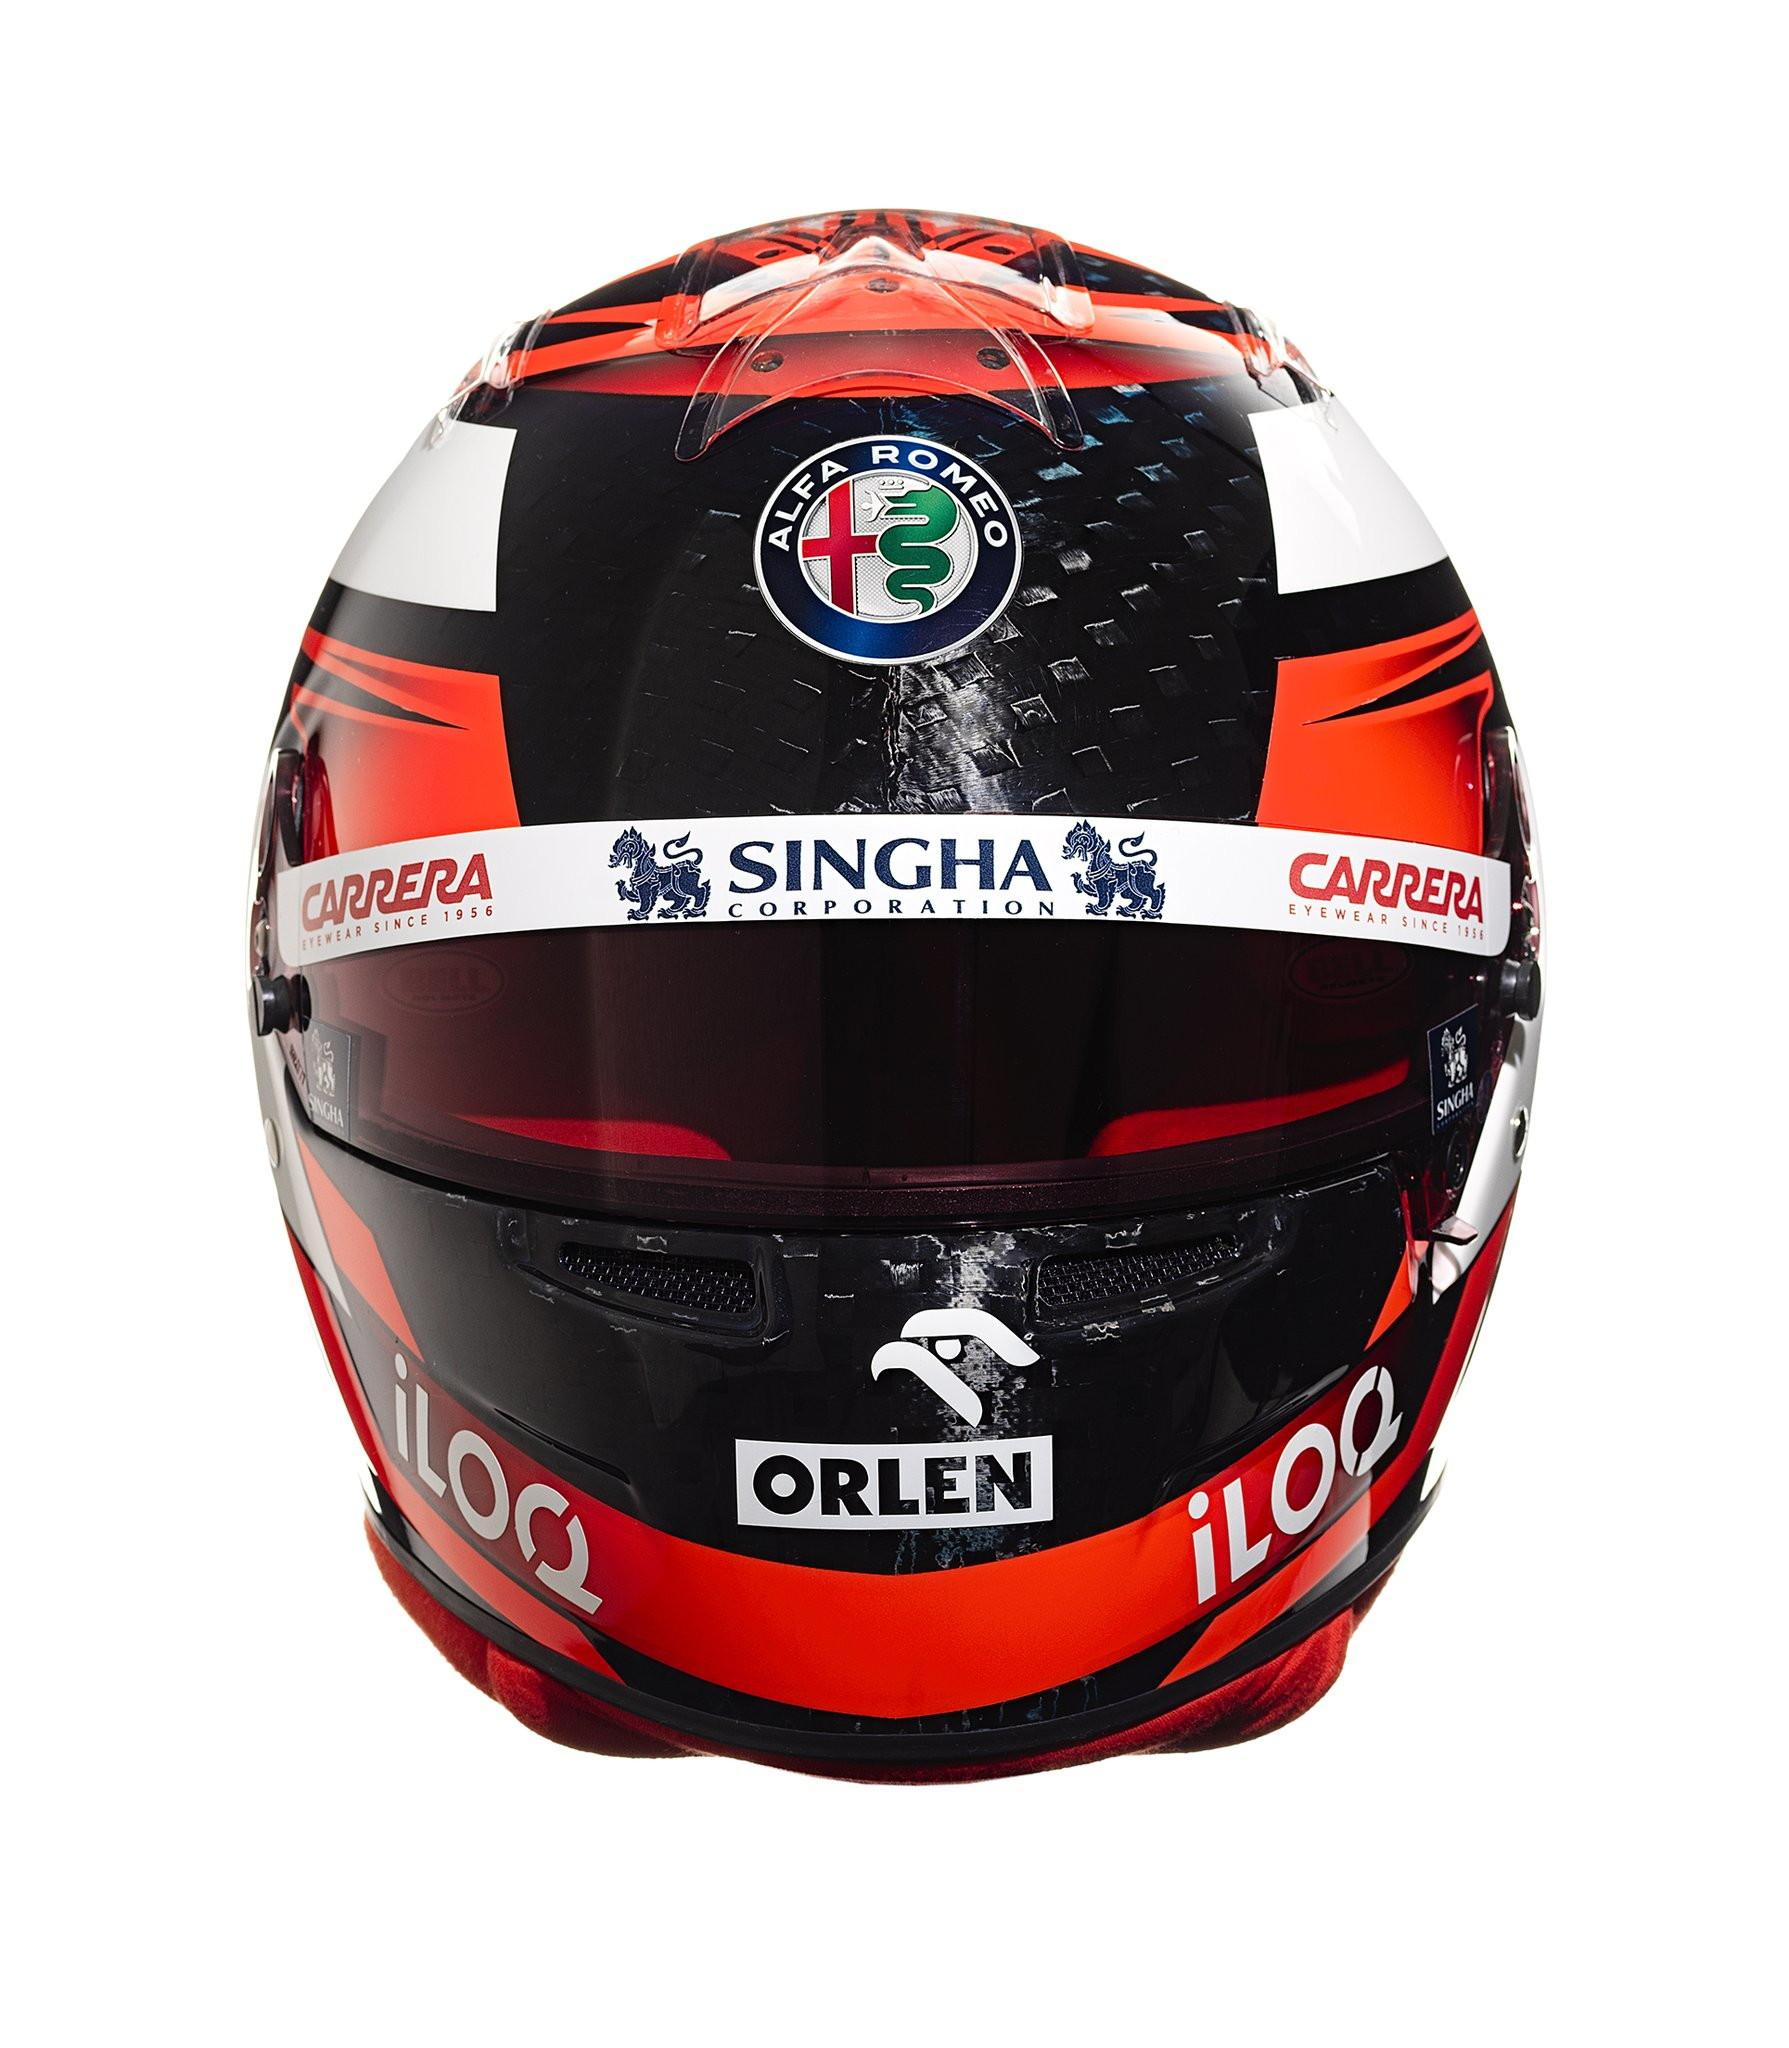 Kimi Raikkonen (Alfa Romeo)